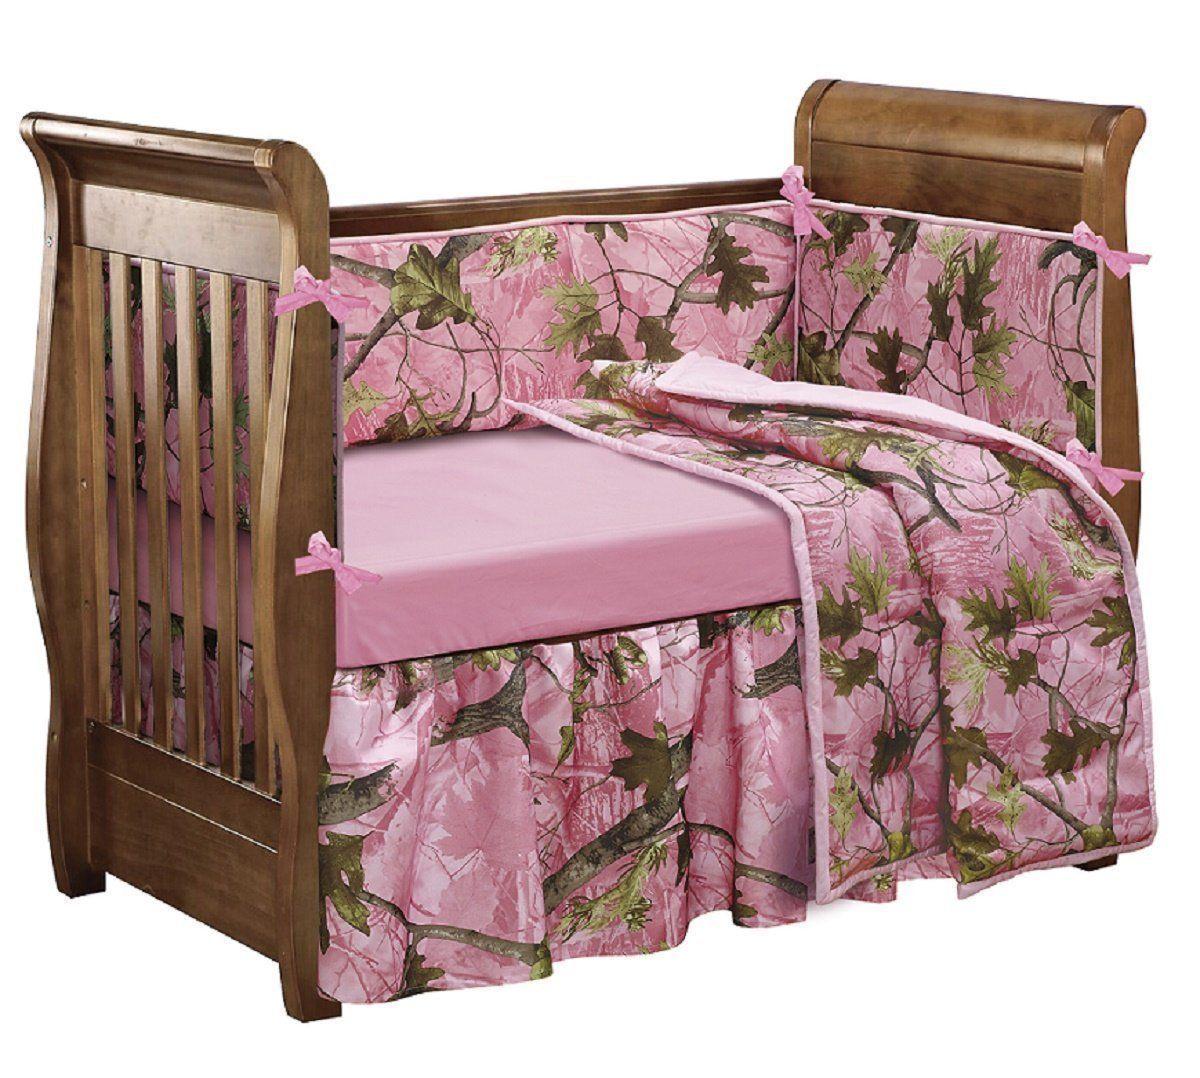 Baby Crib Set Nursery Bedroom Kids Girl Bedding Soft